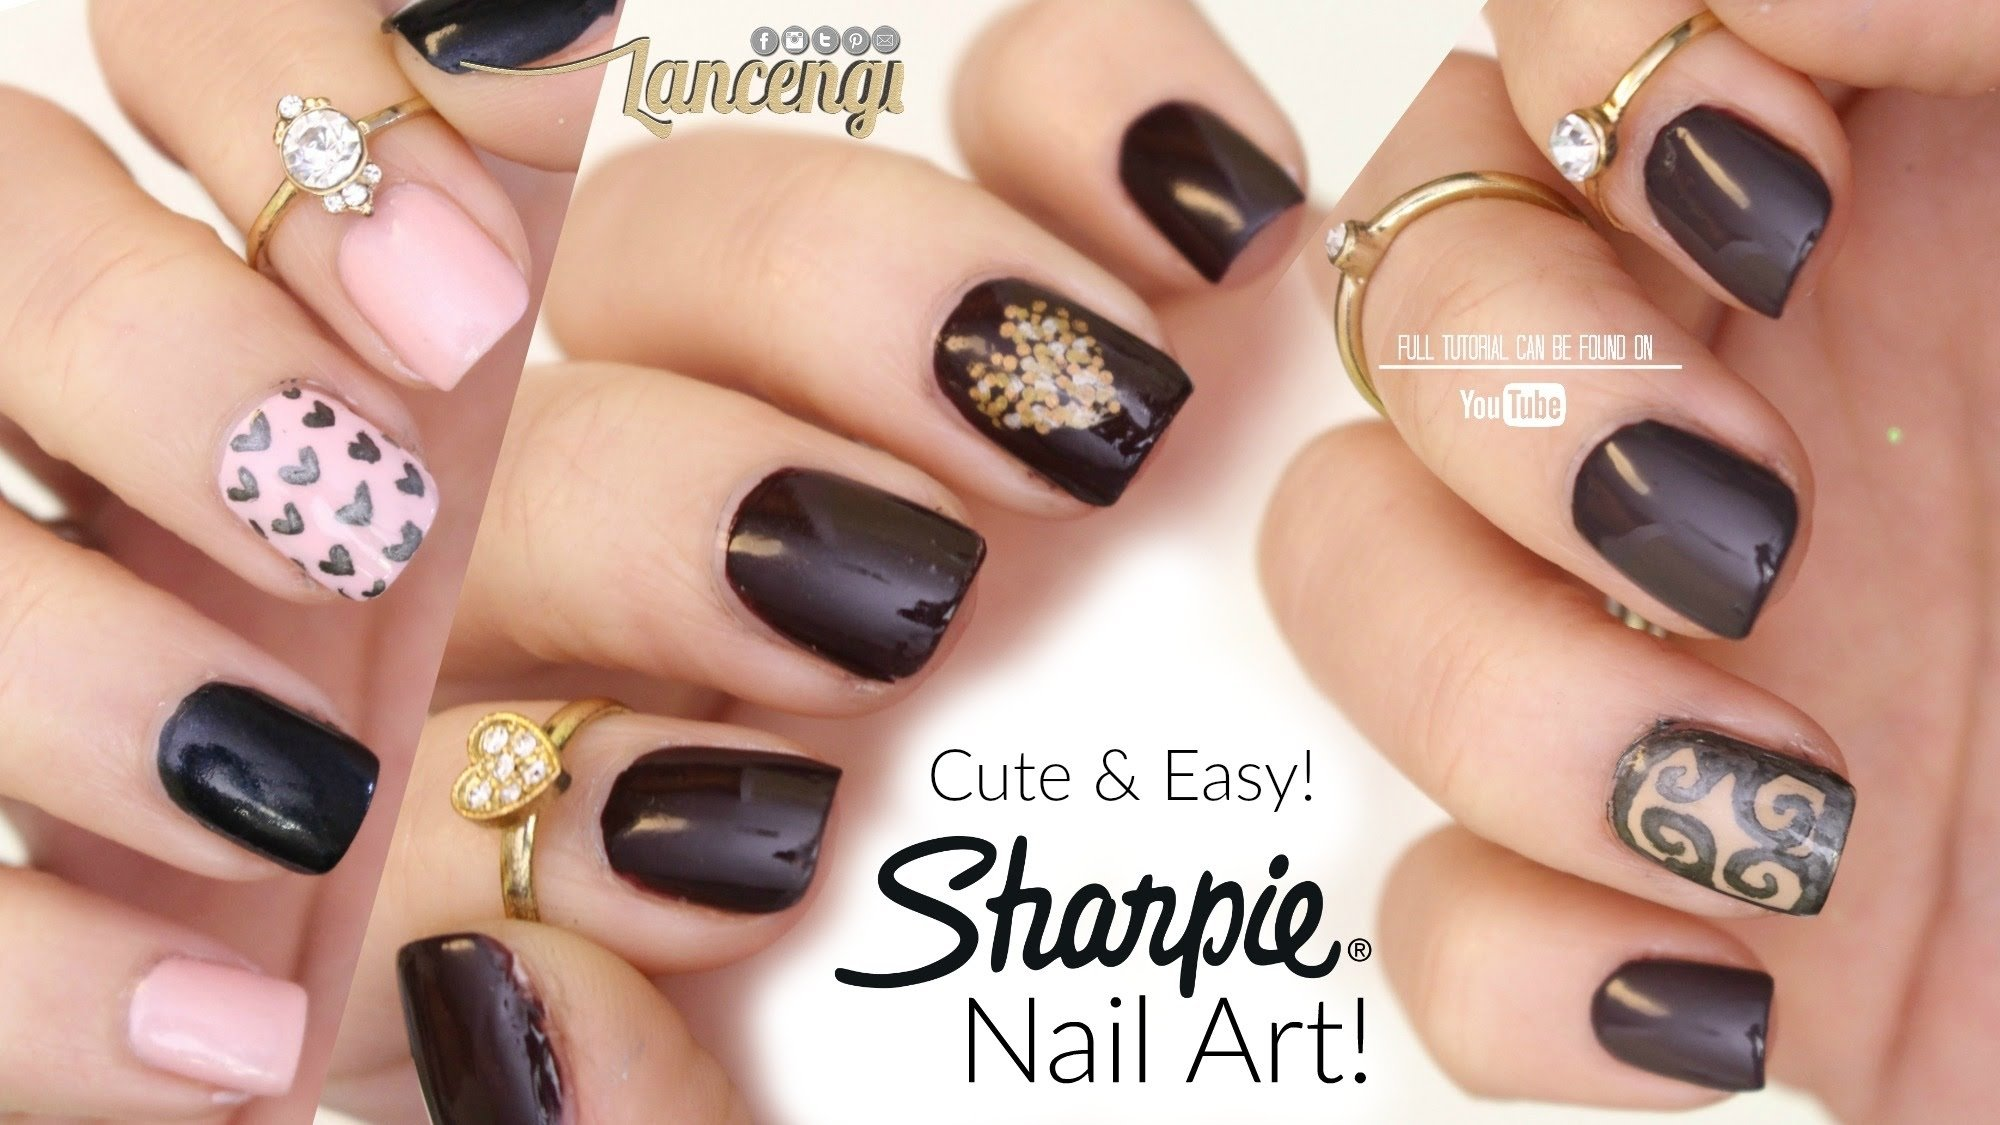 10 Lovable Simple But Cute Nail Ideas